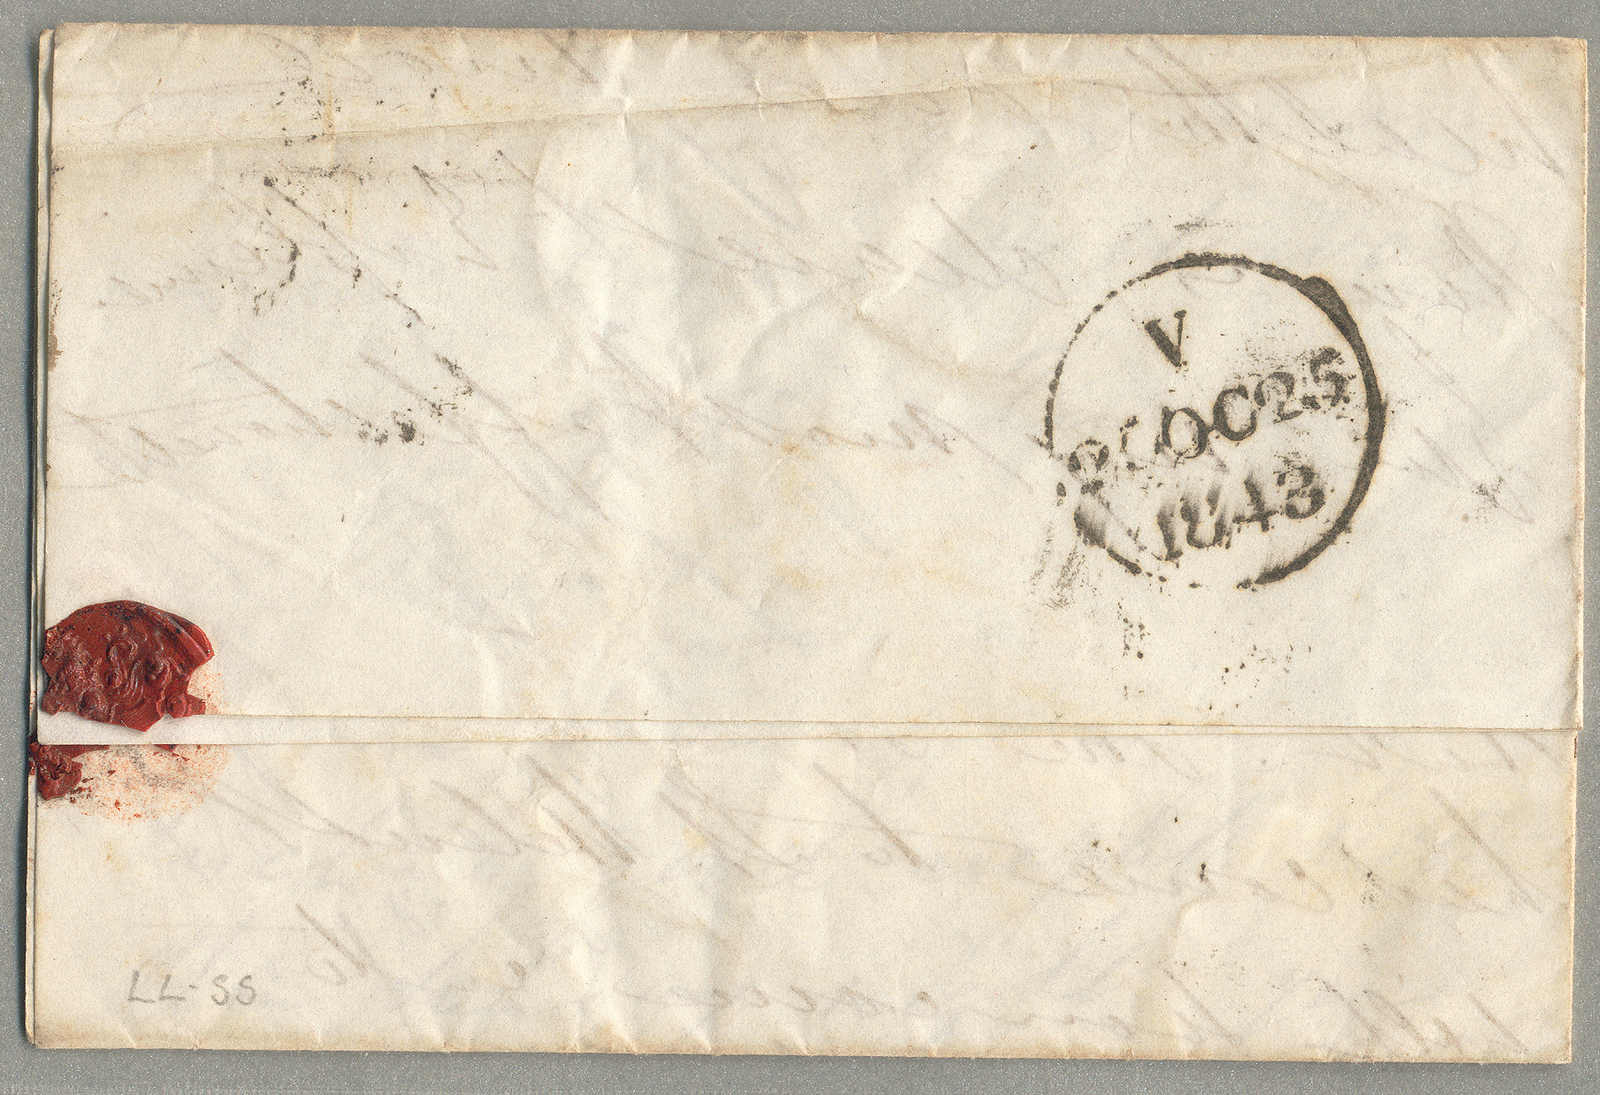 Lot 30183 - europa Grossbritannien 1841 1d und 2d -  classicphil GmbH 6'th classicphil Auction - Day 2